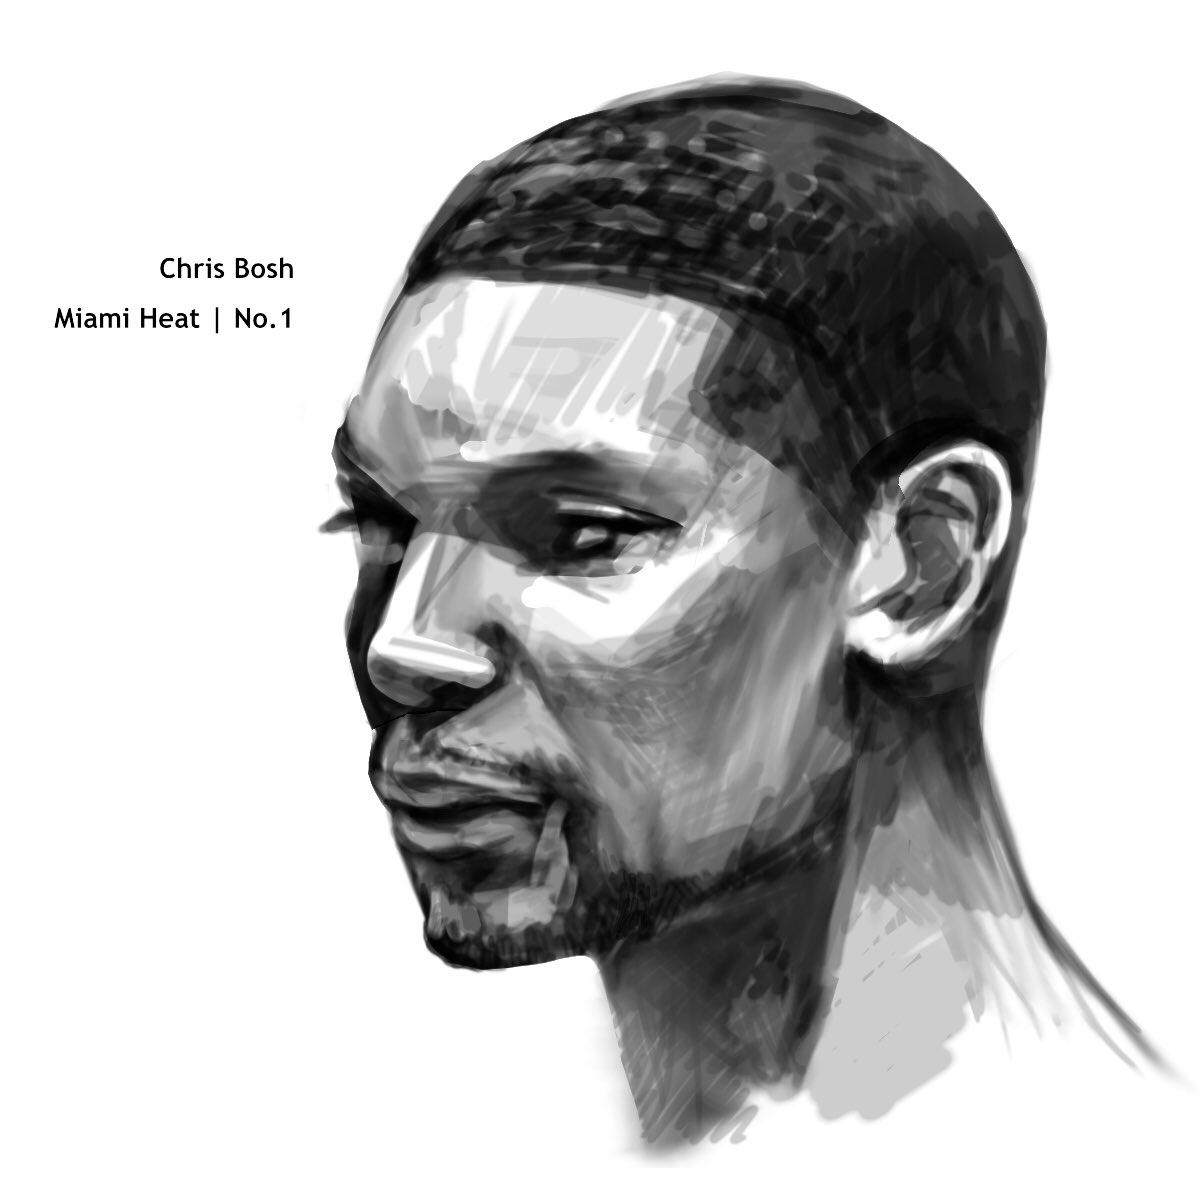 Chris Bosh Miami Heat   No.1 🔥 #ThankYouChr1s #Heatculture  #ChrisBosh #MQdrawing